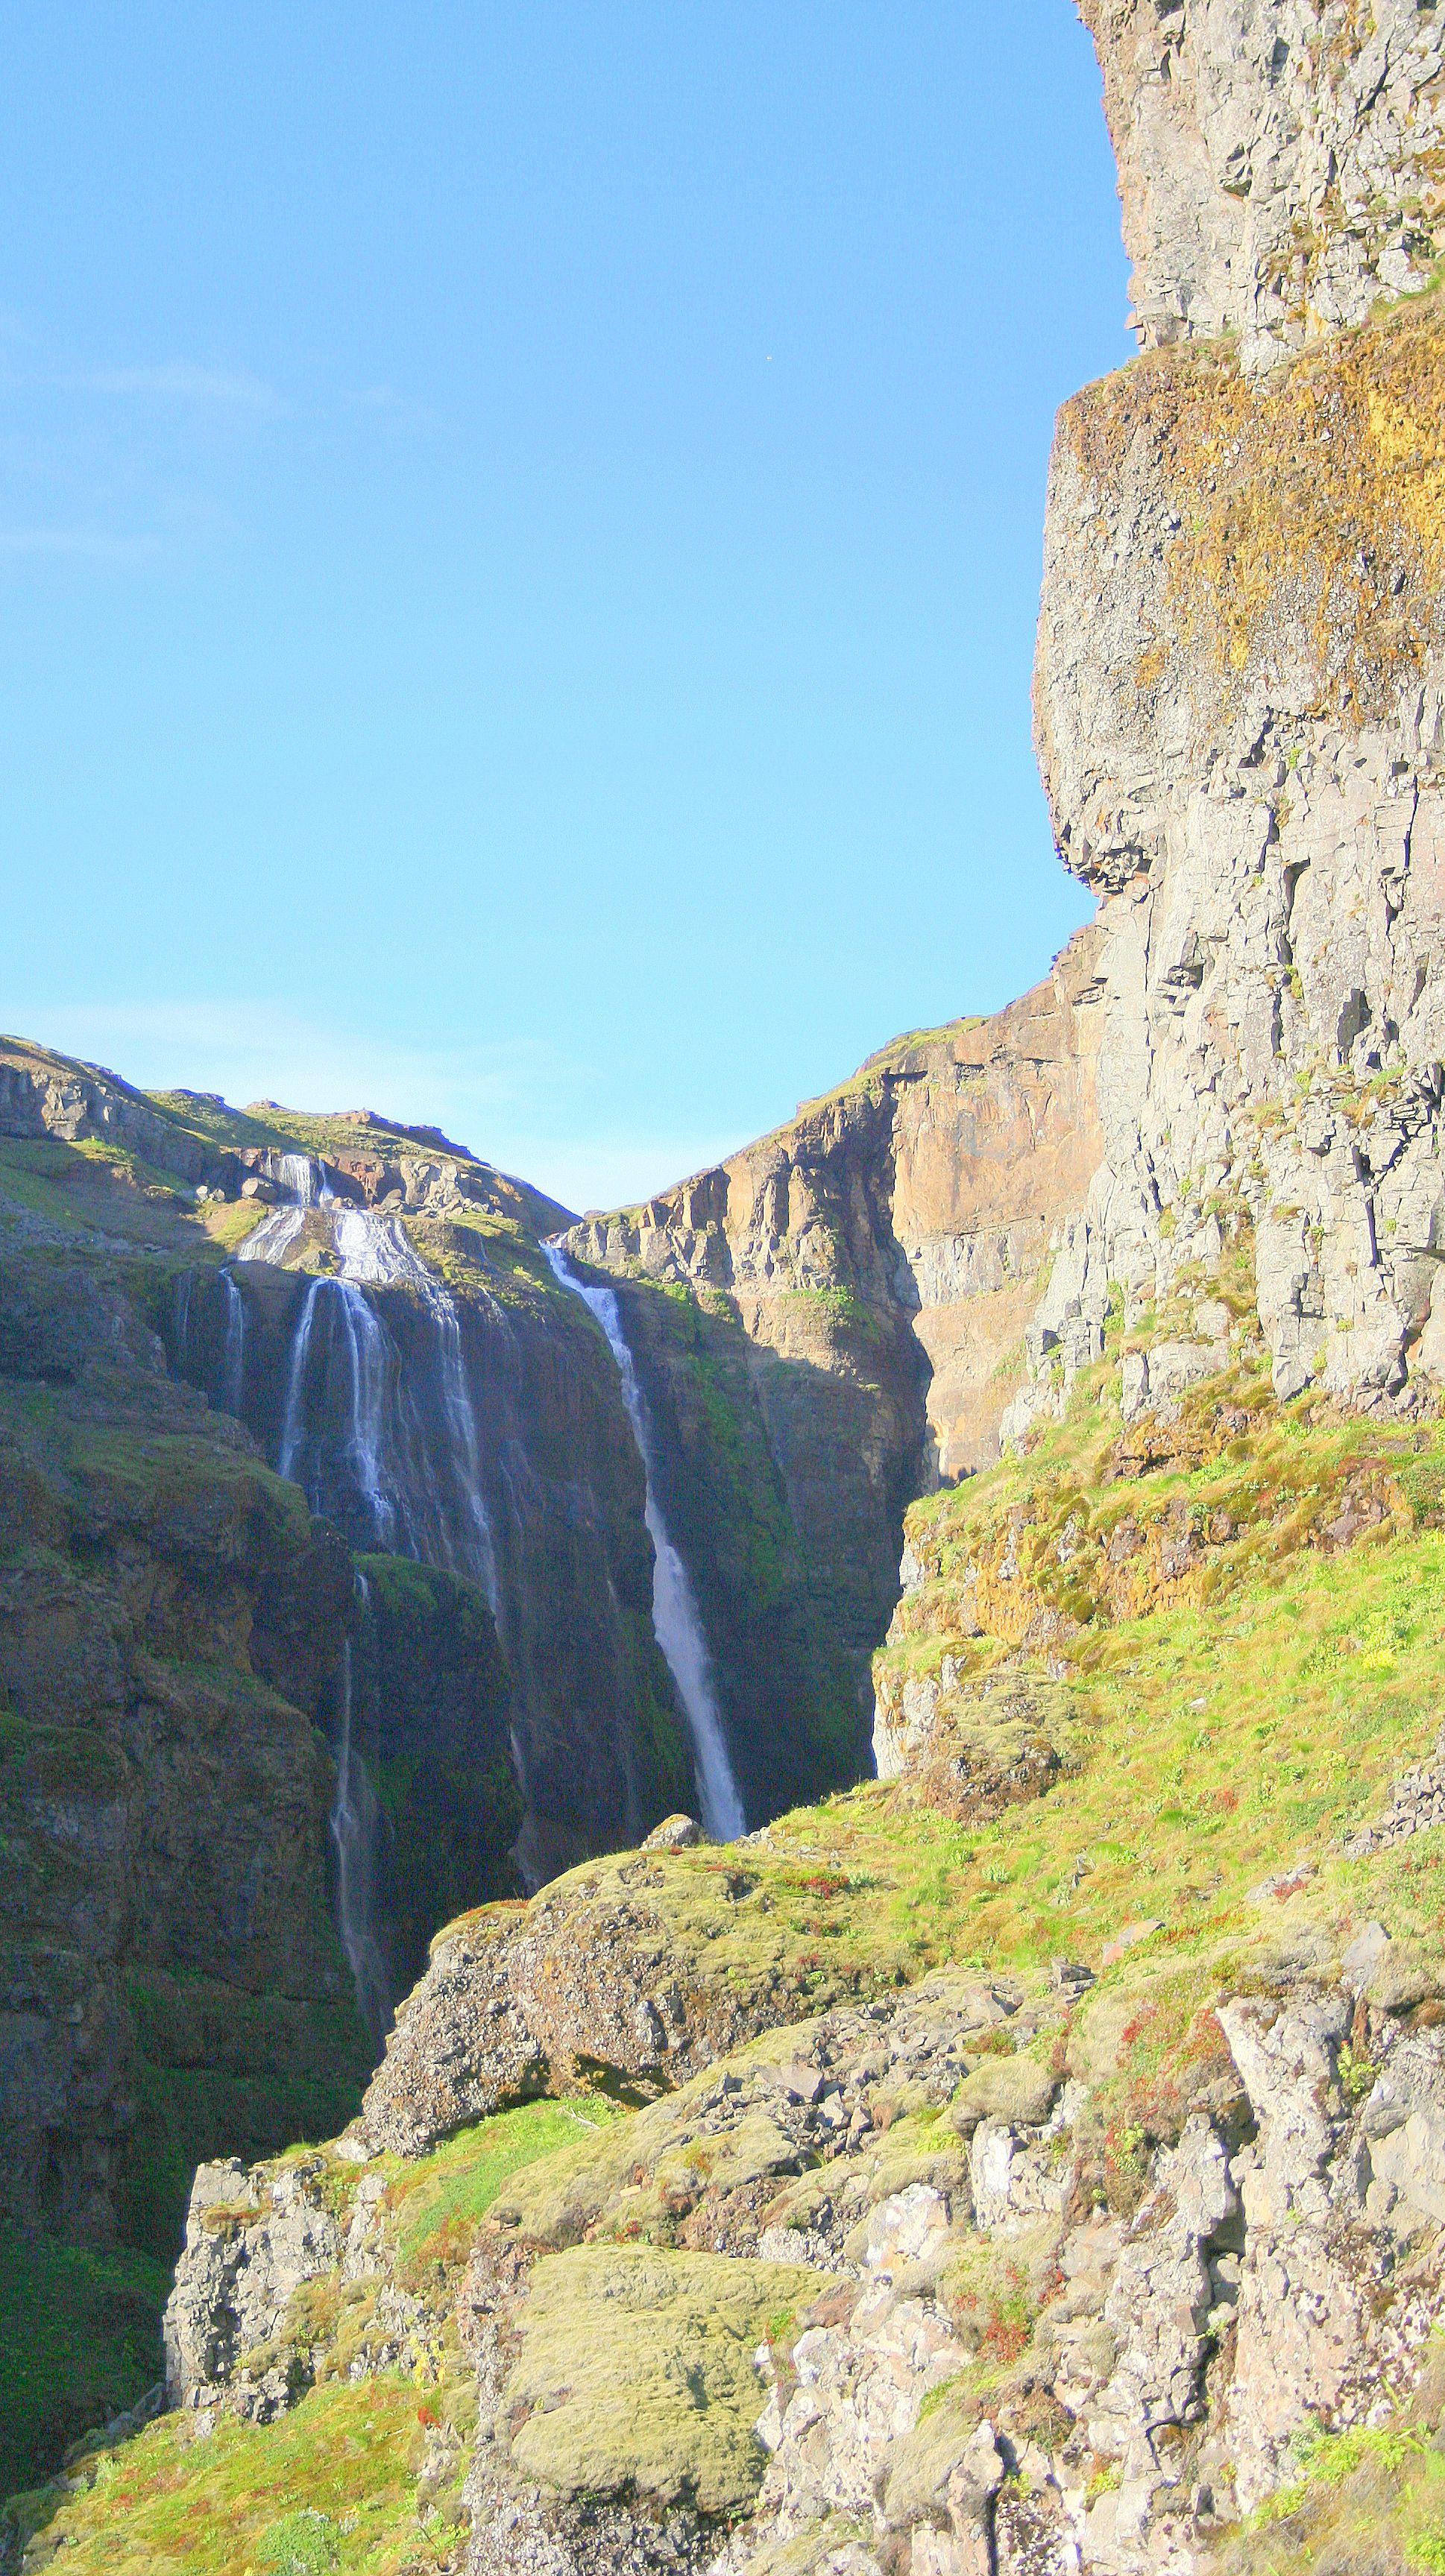 Glymur Waterfall, Iceland's Highest Waterfall.